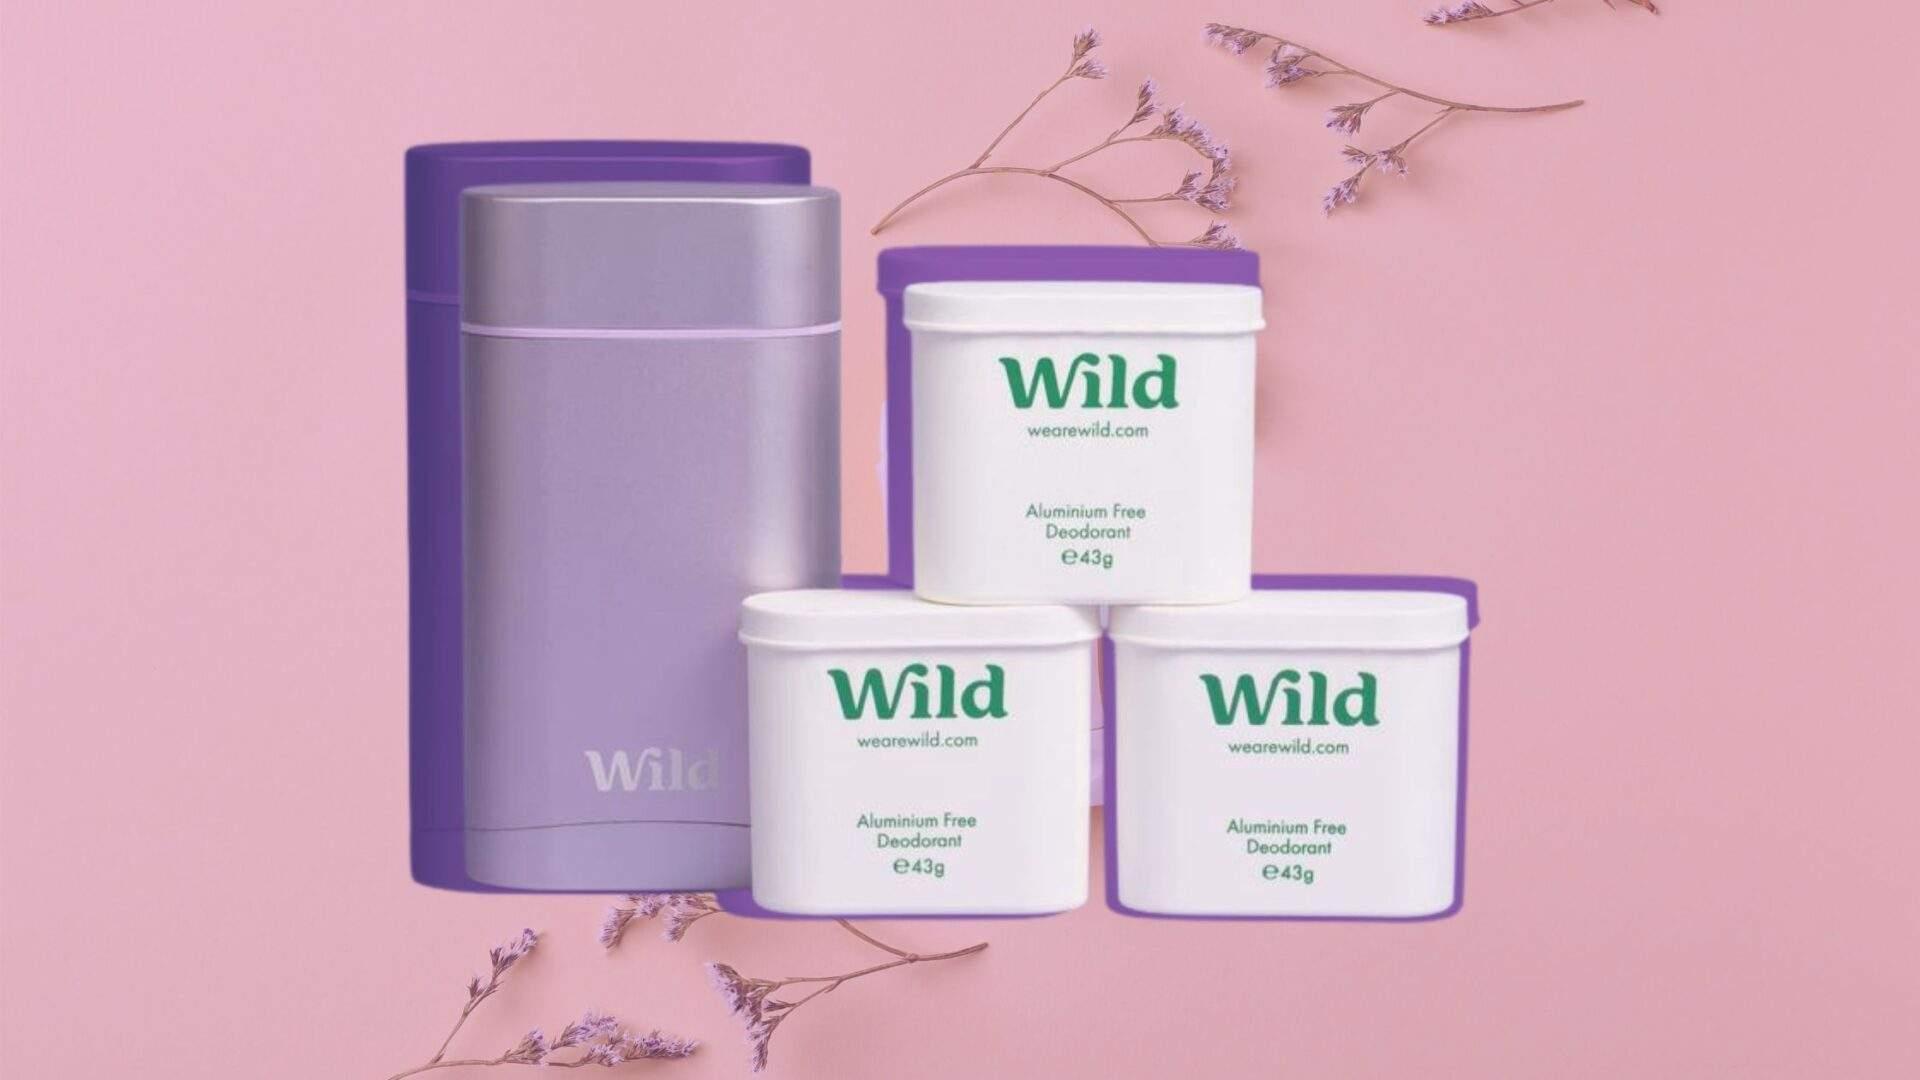 lavender scented vegan deodorant with refills by wild deodorant